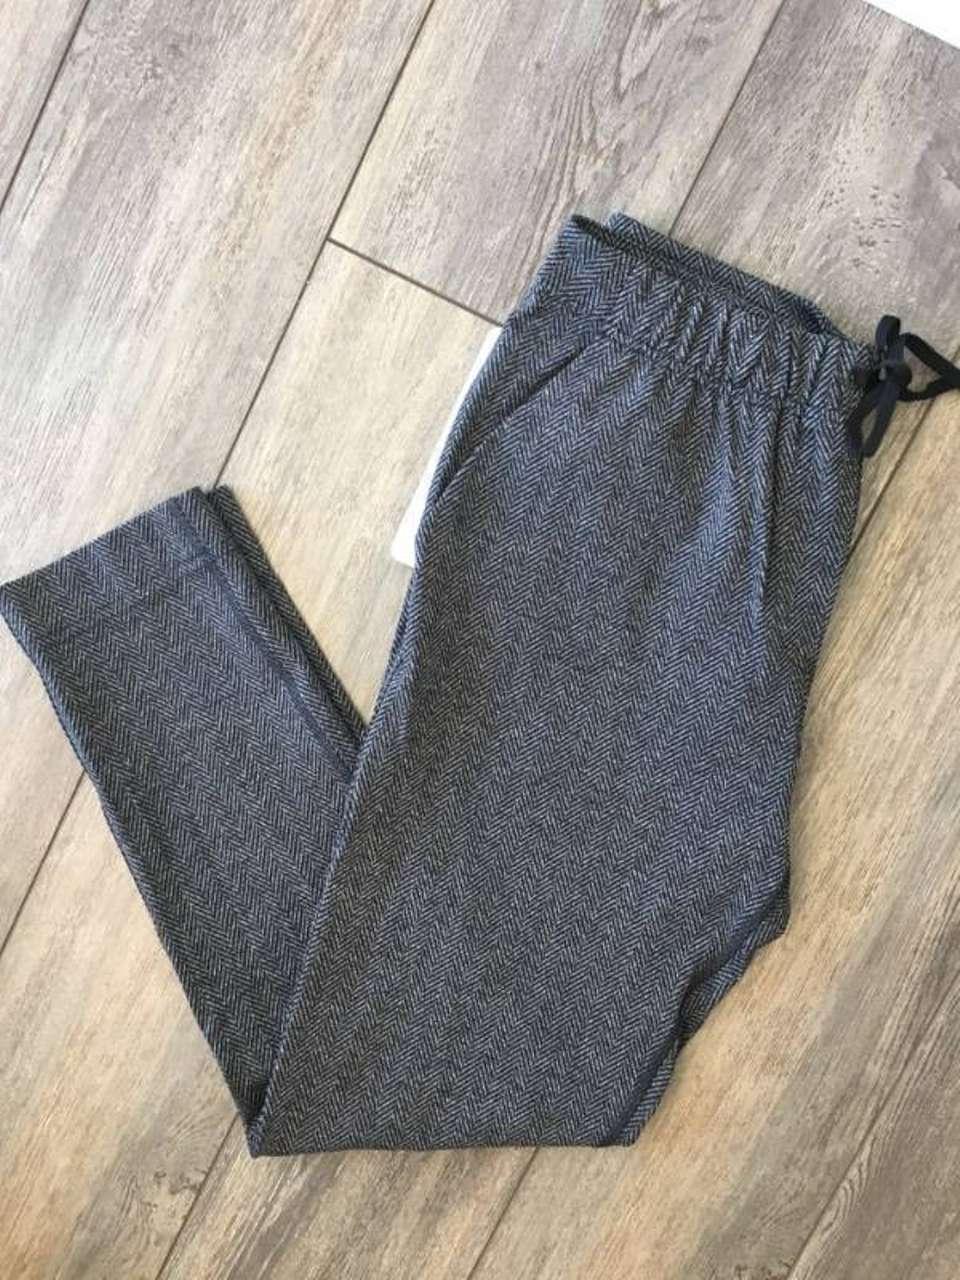 Lululemon Jet Crop (Slim) - Giant Herringbone Black Heathered Black